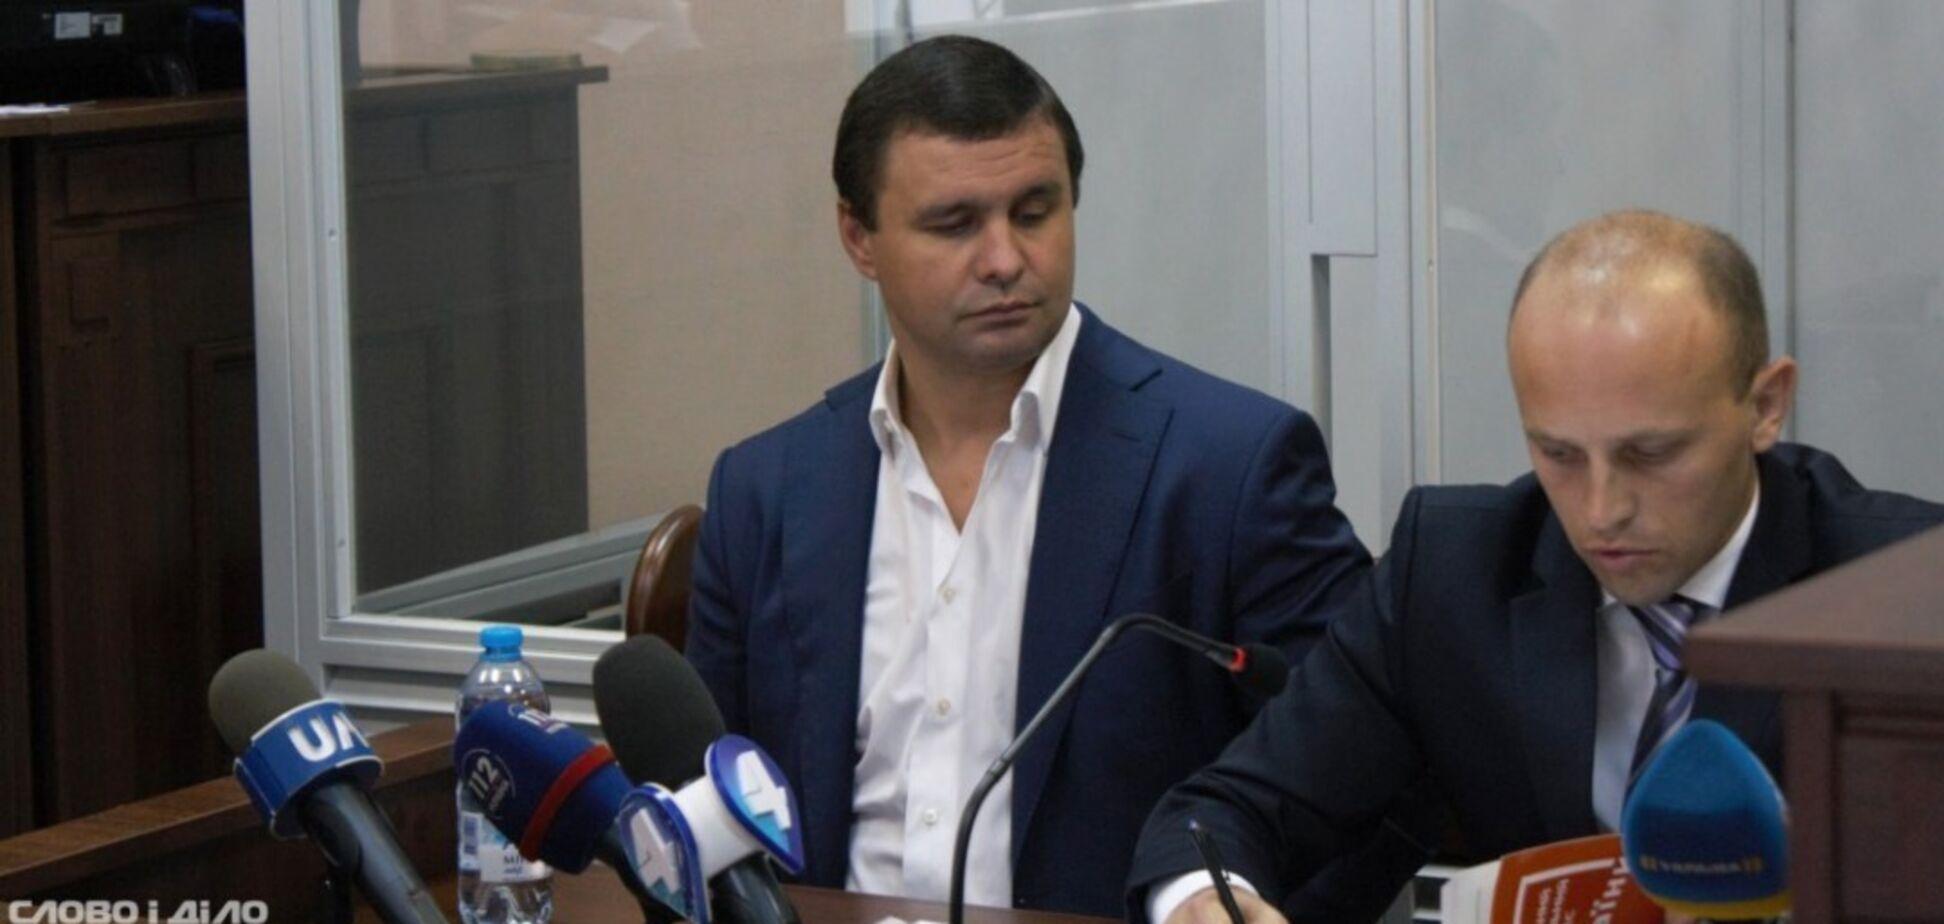 Судьи приняли неожиданное решение, снизив сумму залога для Микитася